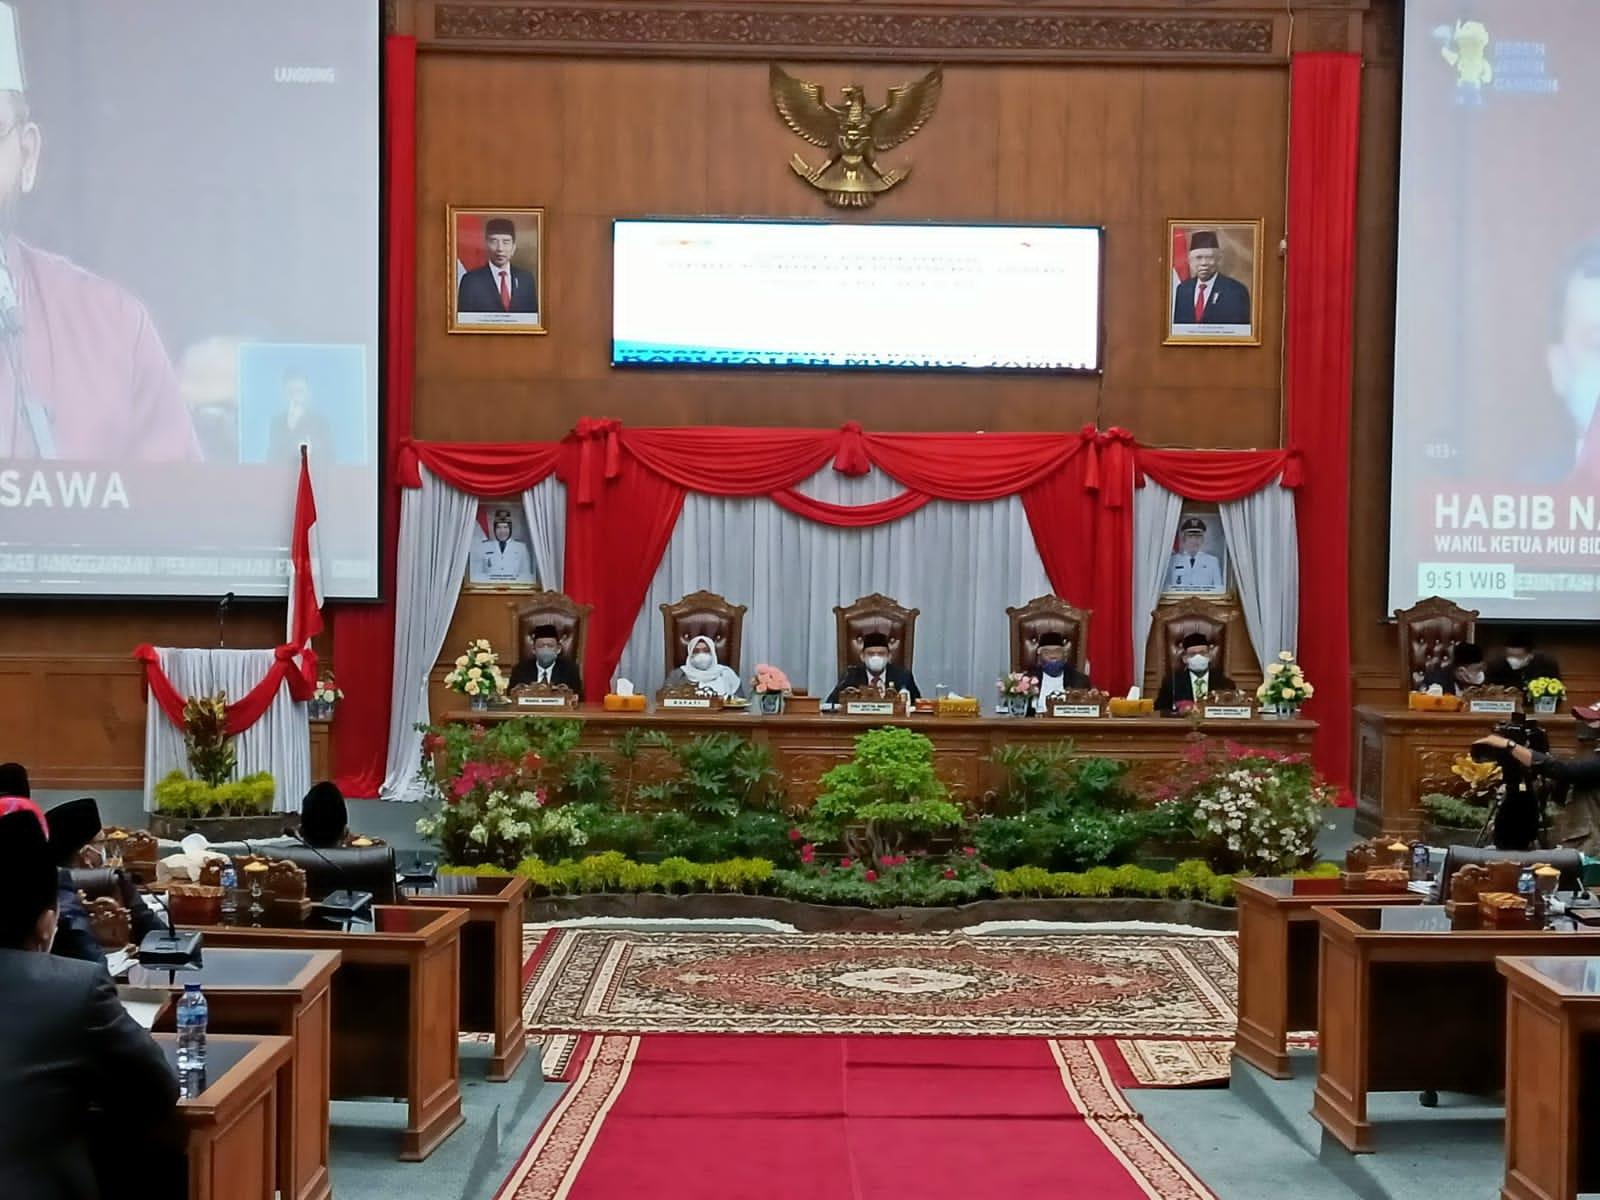 DPRD Muarojambi Rapat Istimewa Mendengarkan Pidato Presiden